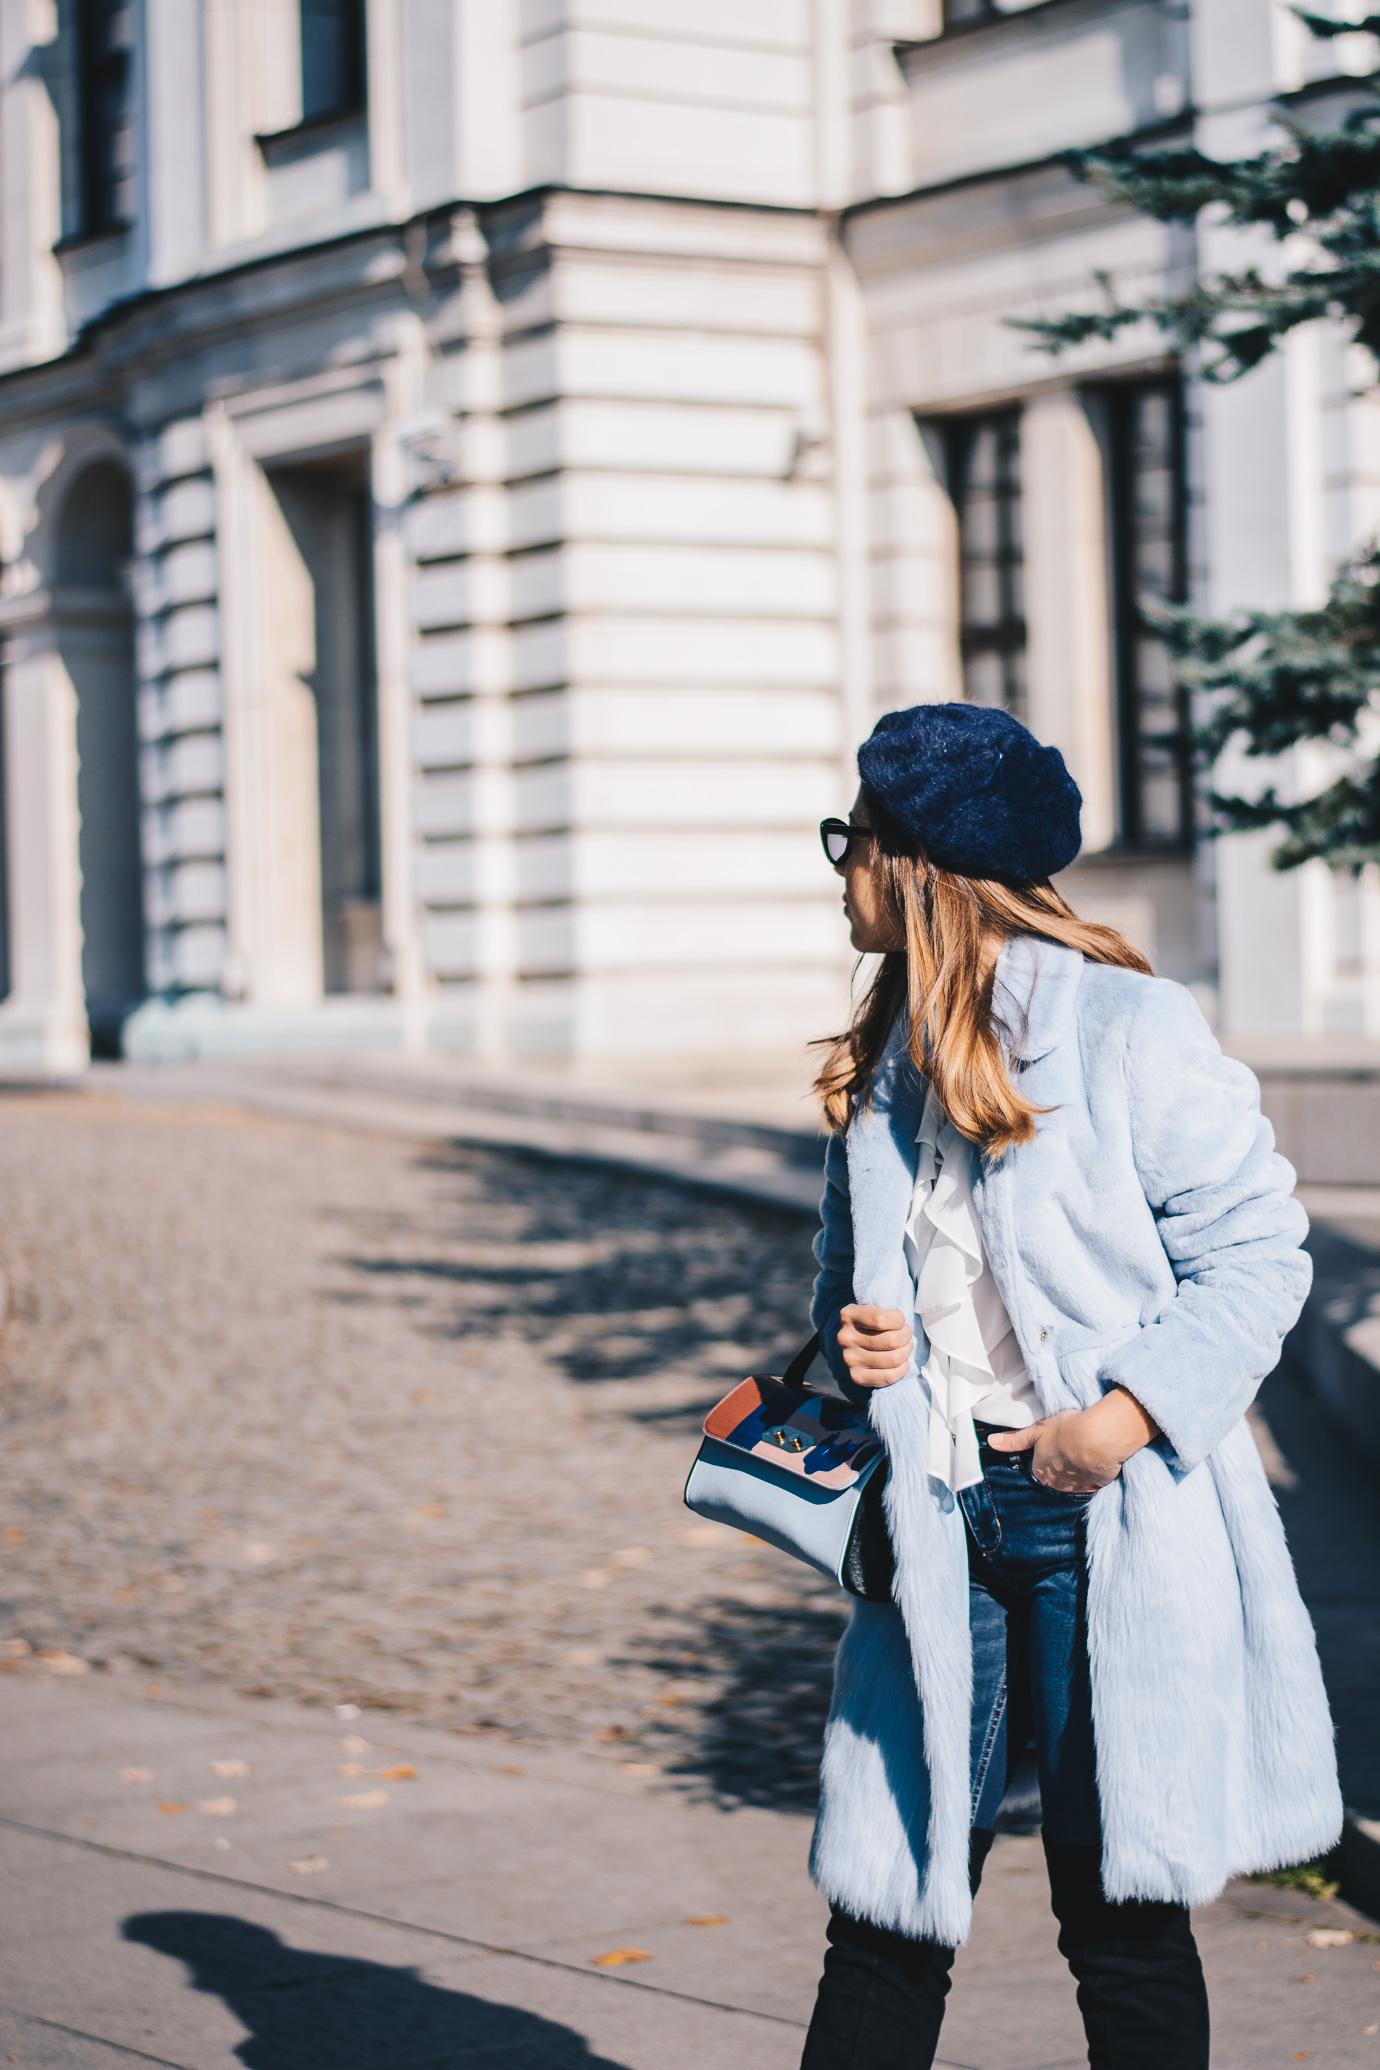 Winter blue coat